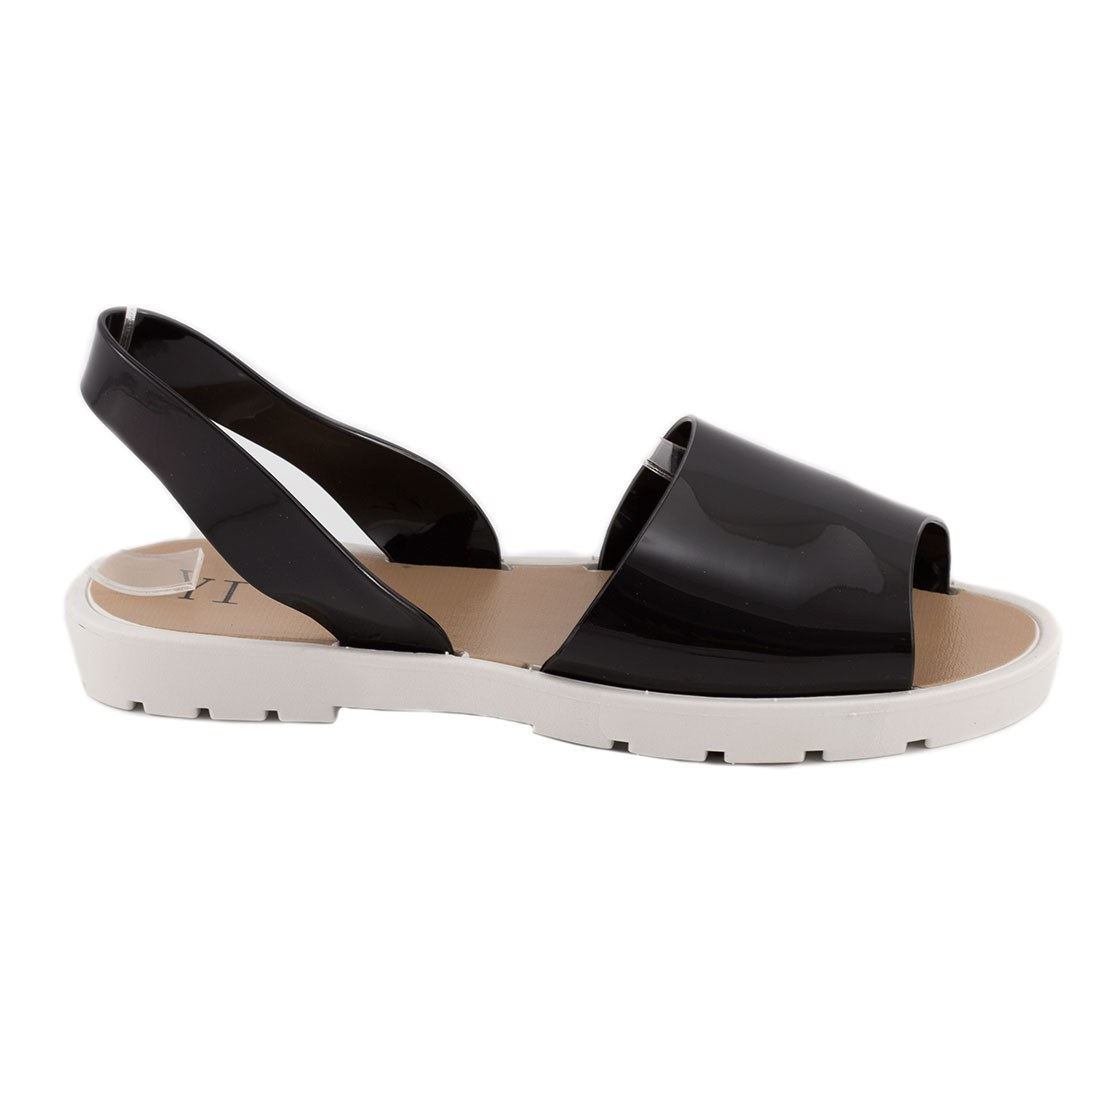 Sandale dama comode S-14-NEGRU